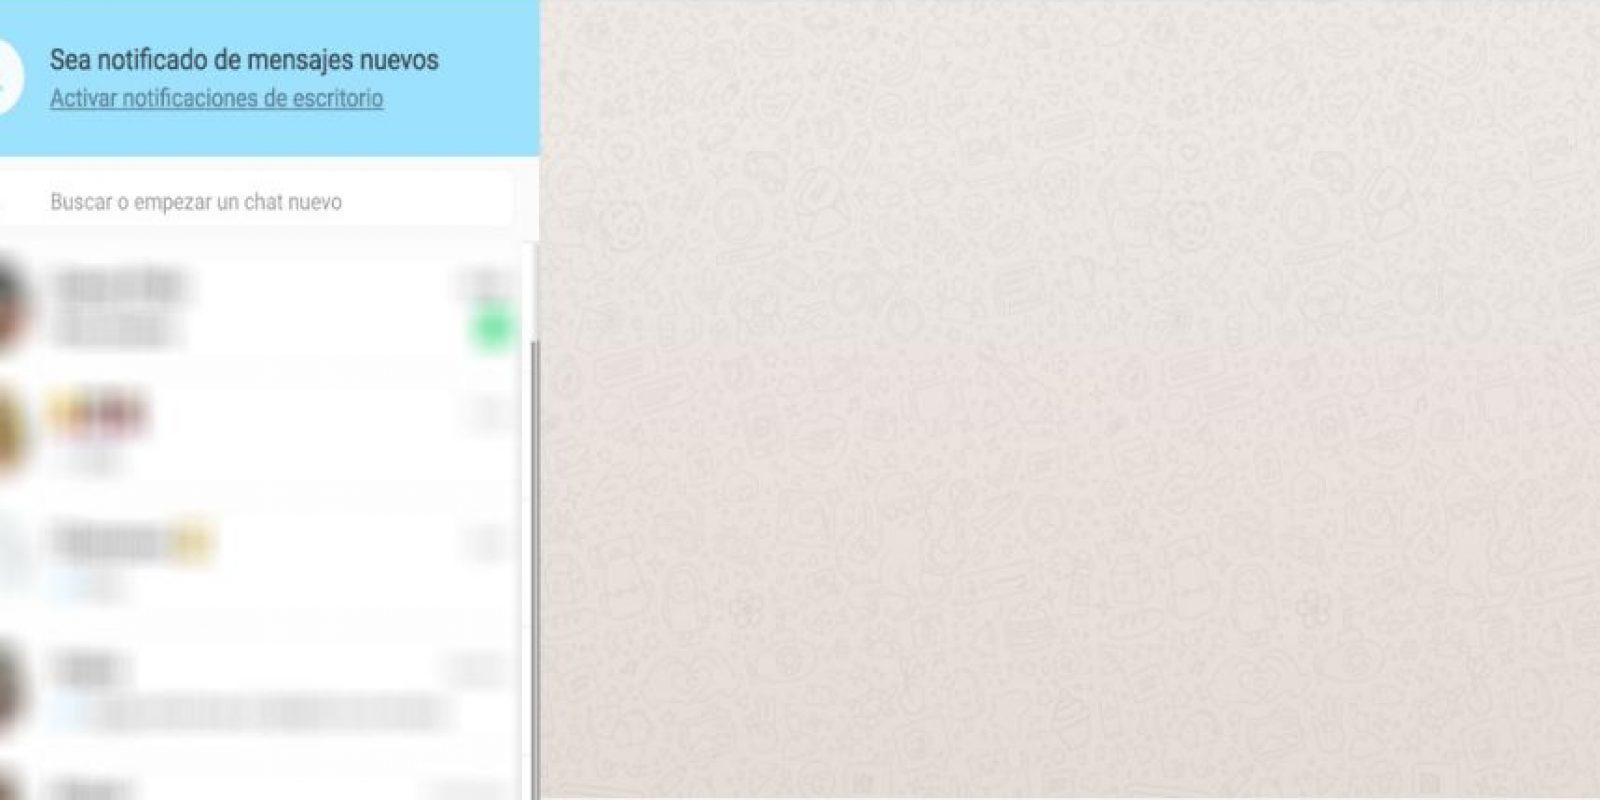 WhatsApp para PC y Mac. Foto:WhatsApp. Imagen Por: